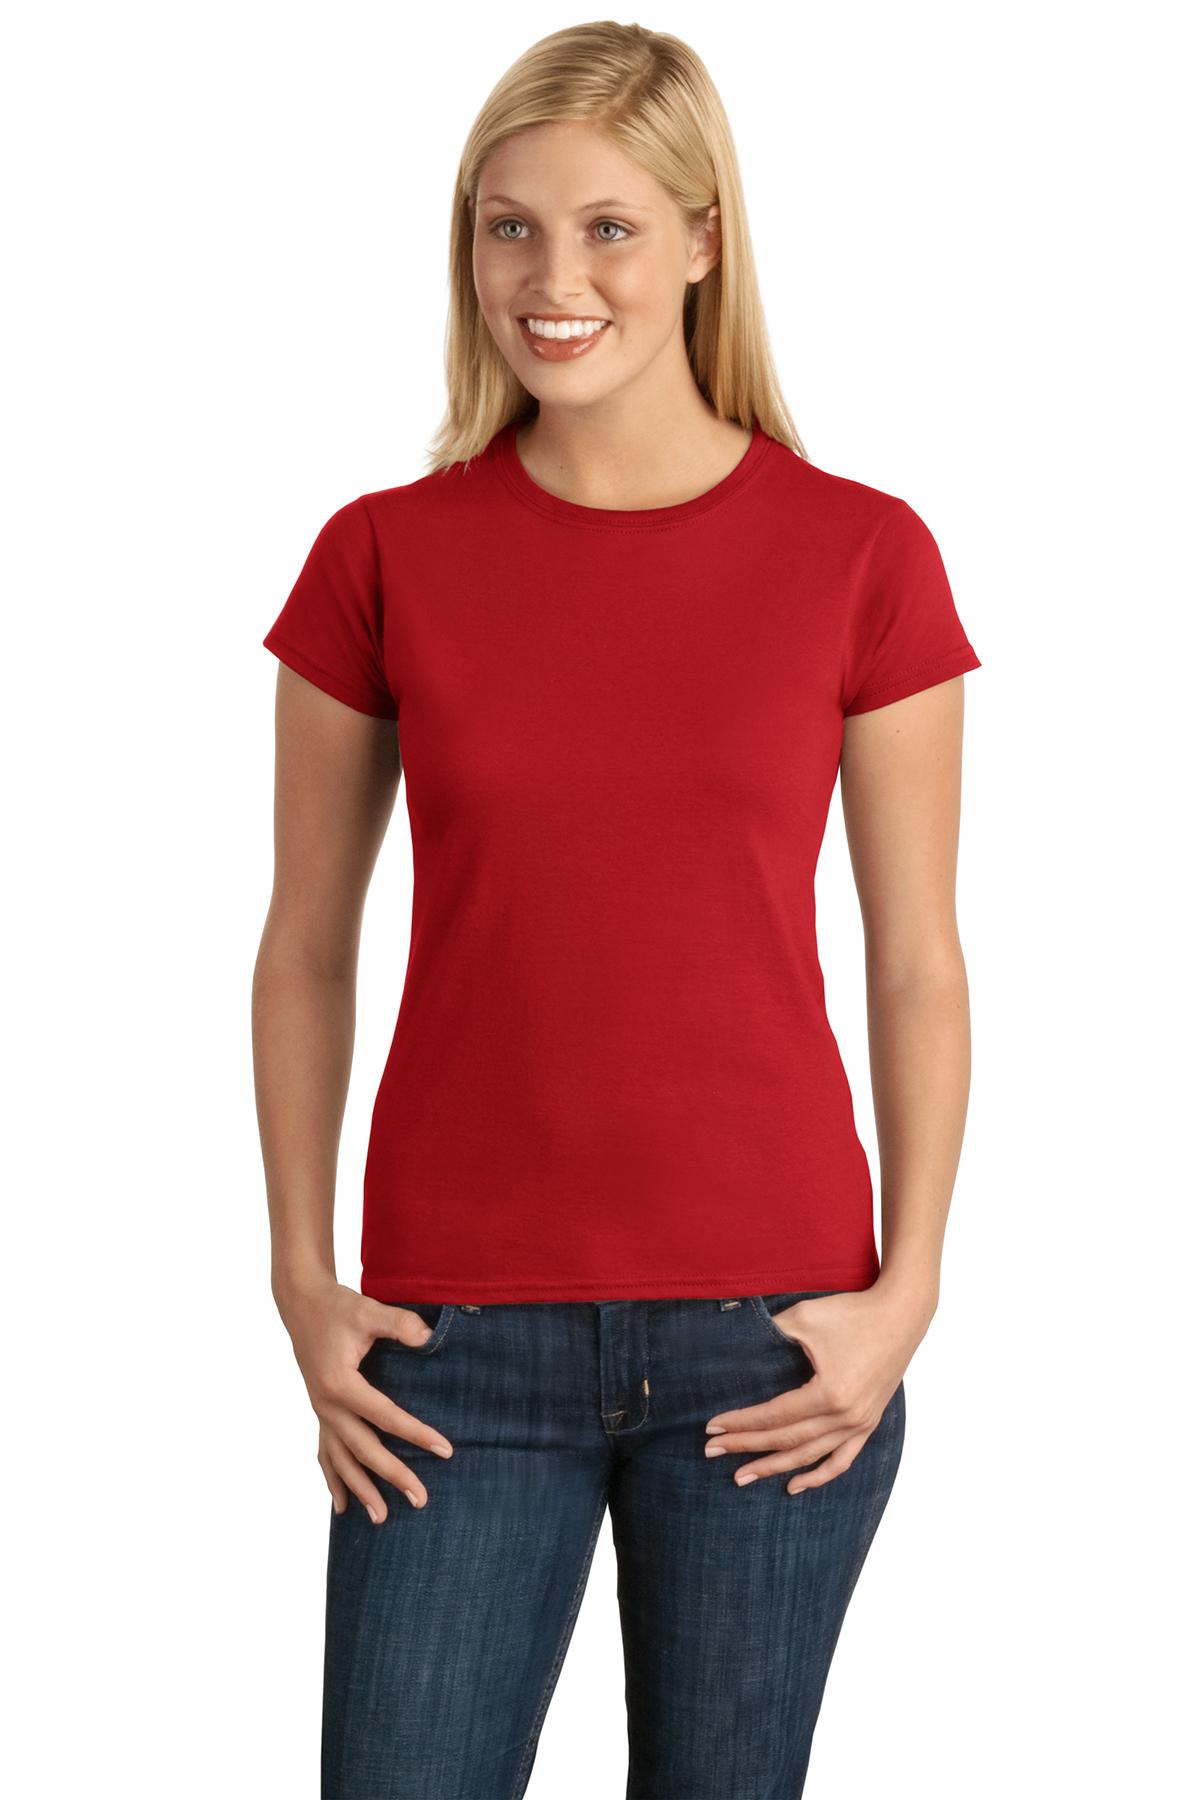 efb47def52c02 Gildan Softstyle® Junior Fit T-Shirt